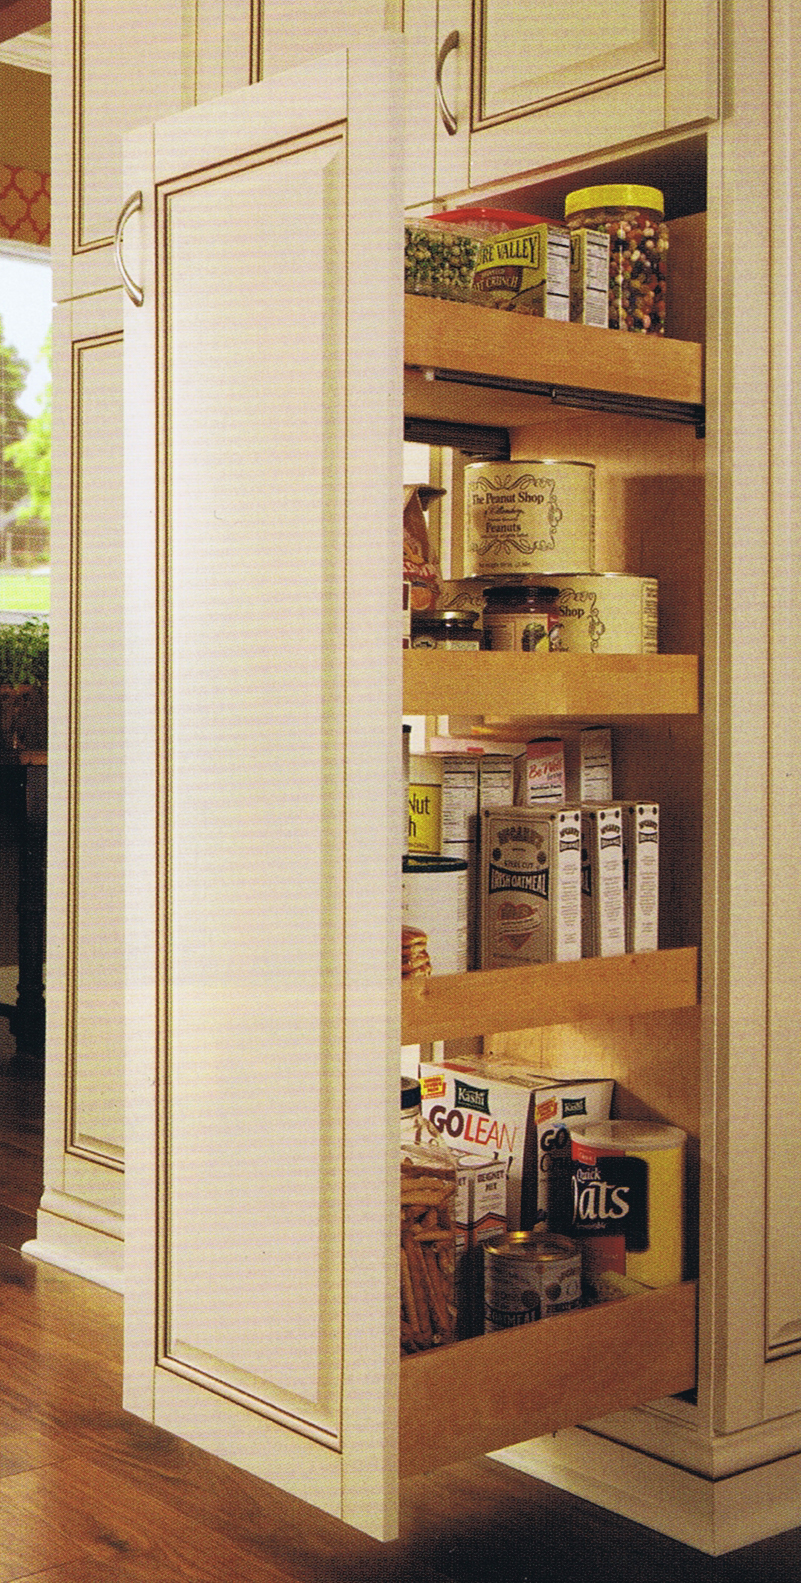 kitchen cabinets sarasota hotels with kitchens design-craft cabinetry: organization | cabinetsextraordinaire